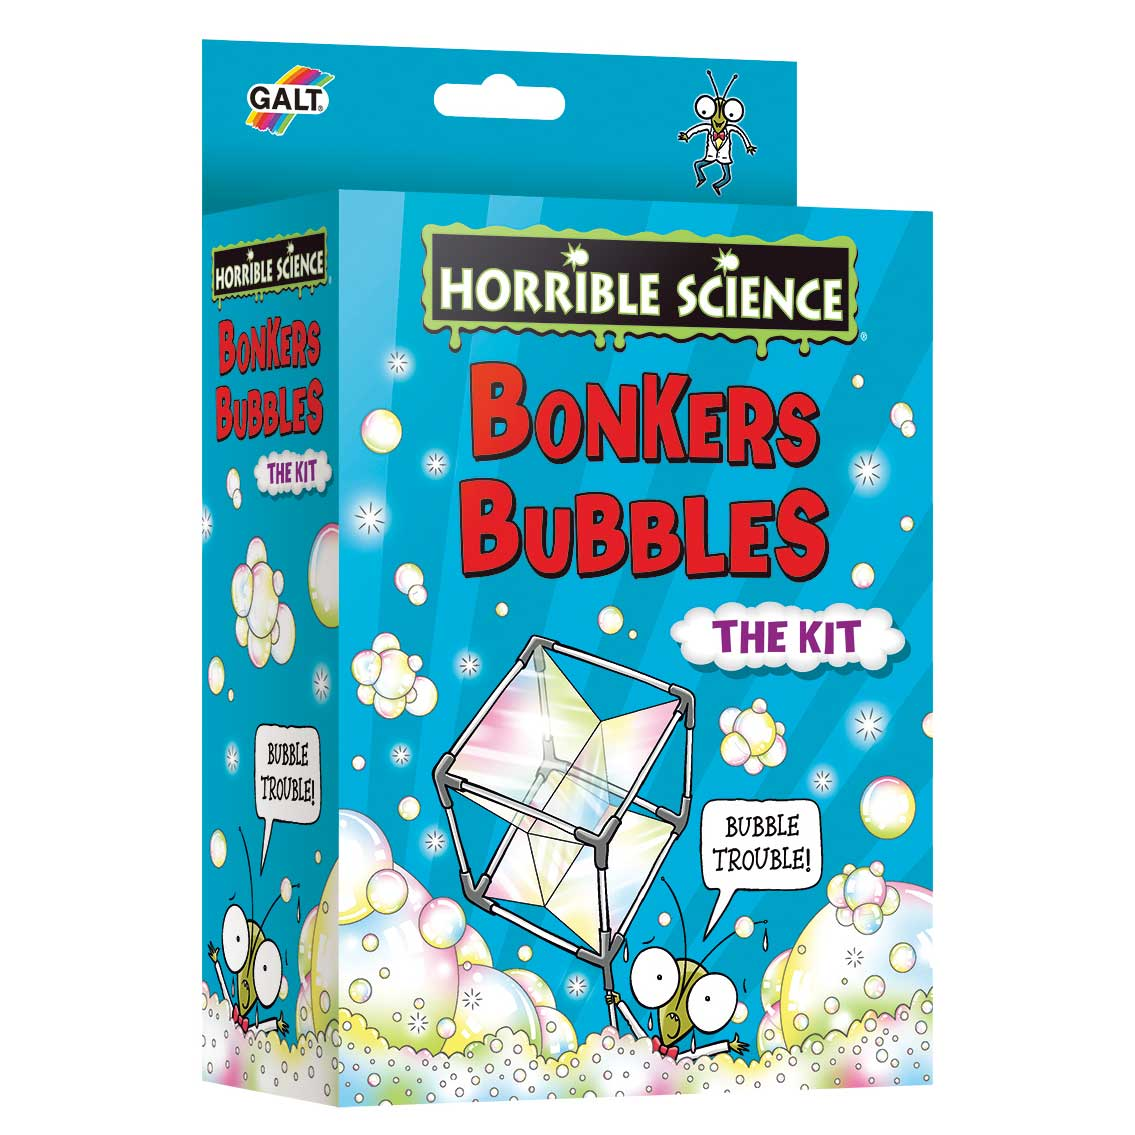 Horrible Science – Bonkers Bubbles (4M-LL5437)